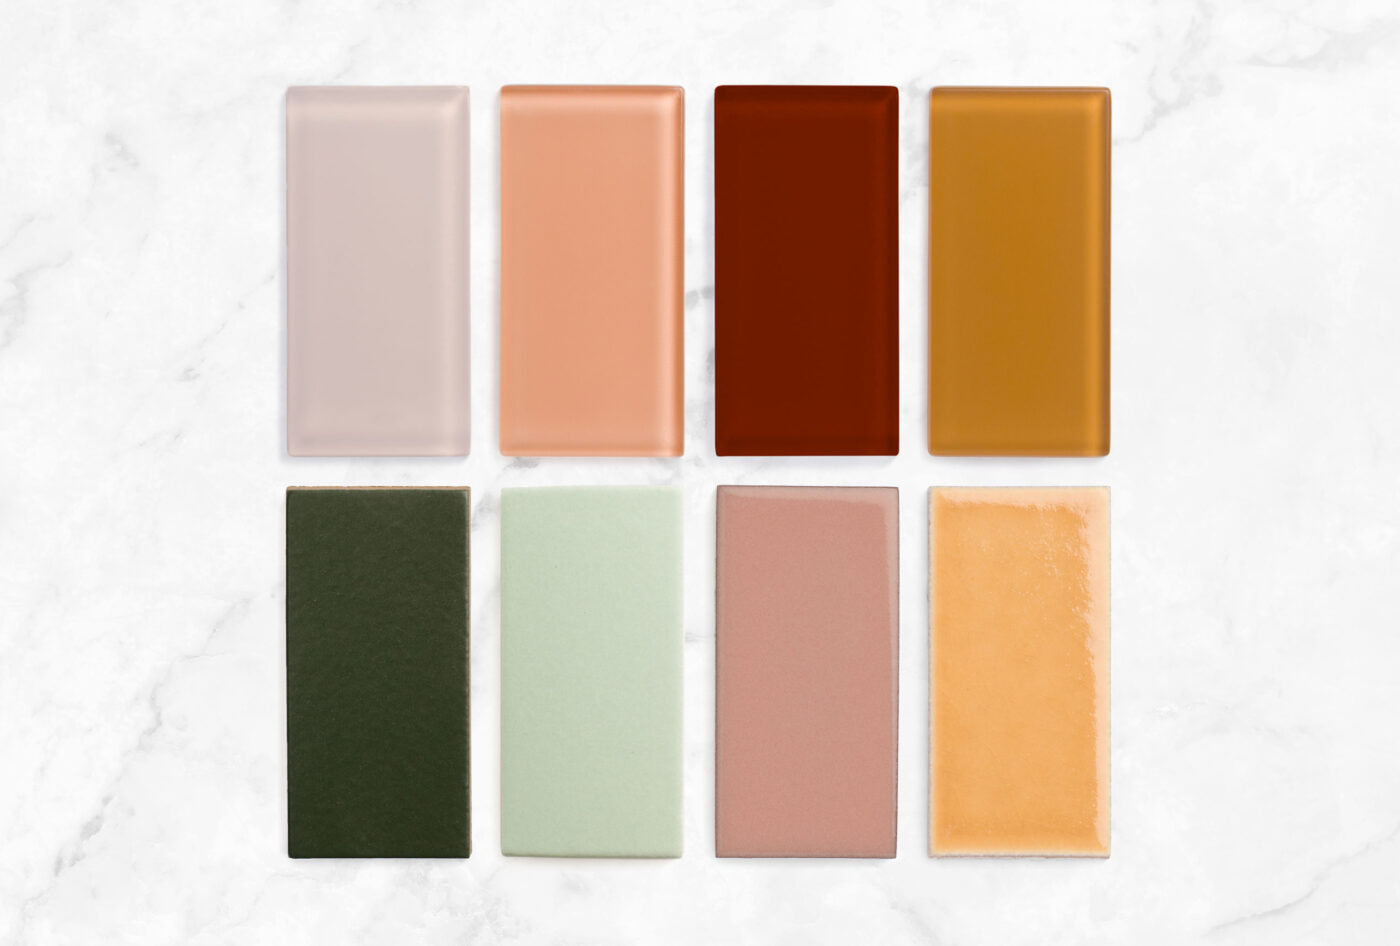 2021 HS Sample Pack Rosy Finch Matte Carolina Wren Gloss Pheasant Gloss Falcon Matte Hunter Green Sea Glass Mesa Koi 2x4